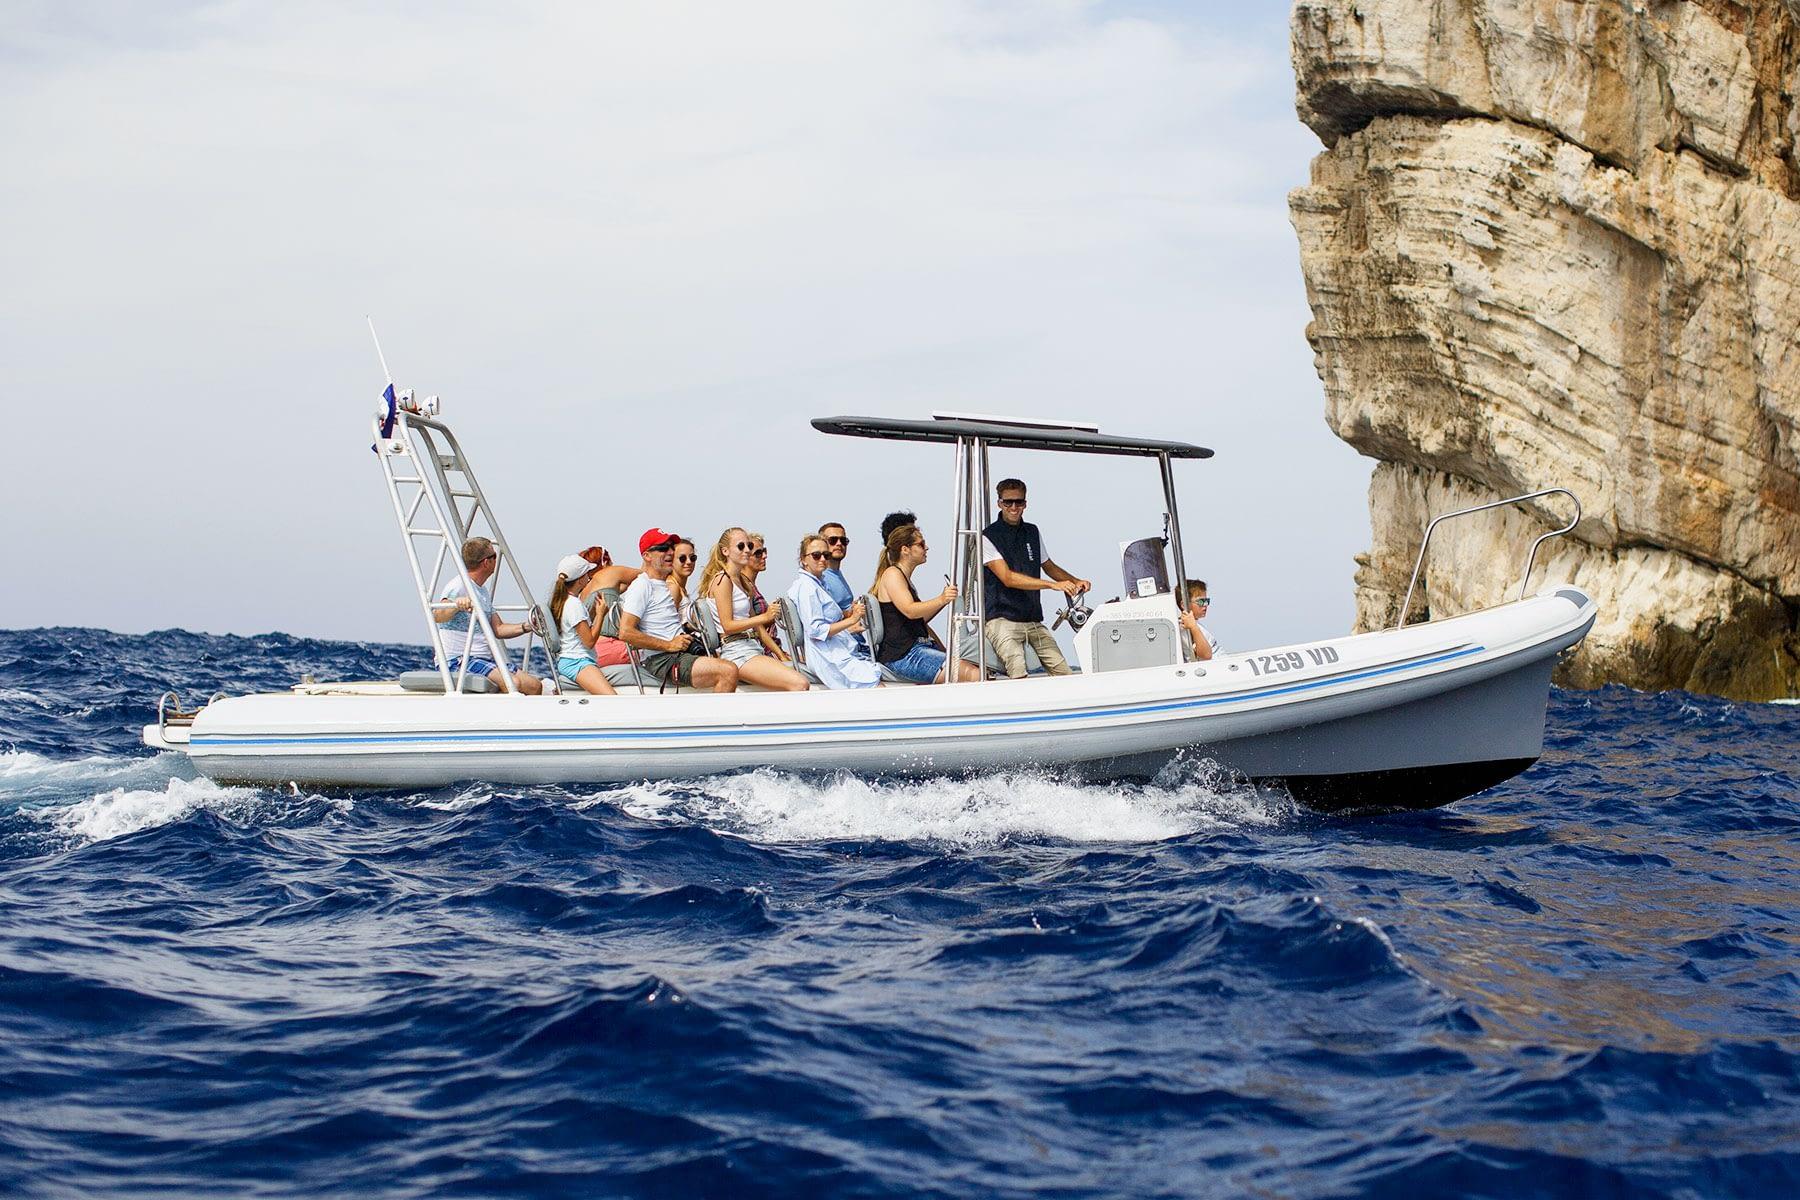 Archipelago Tours - Colnago boat photo taken under the cliffs in Kornati national Park